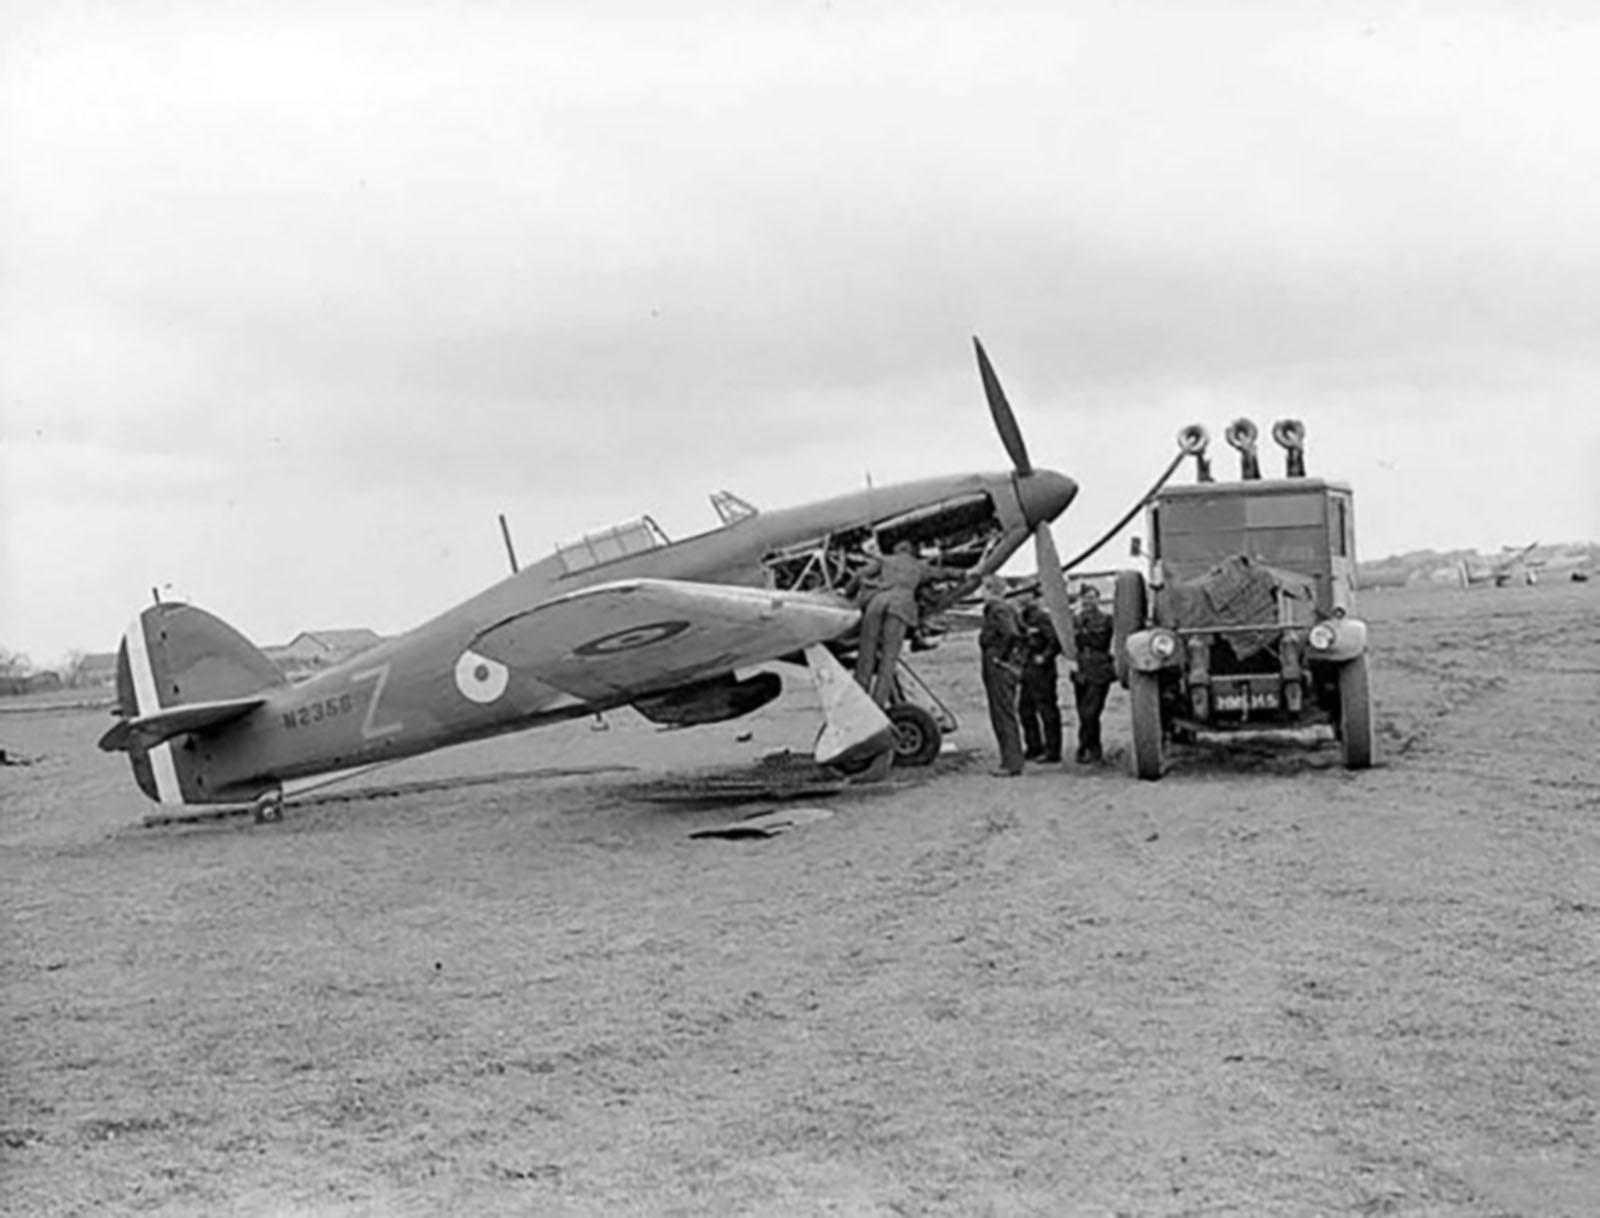 Hawker Hurricane I RAF 1Sqn Z N2358 engine check Vassincourt France 1940 01